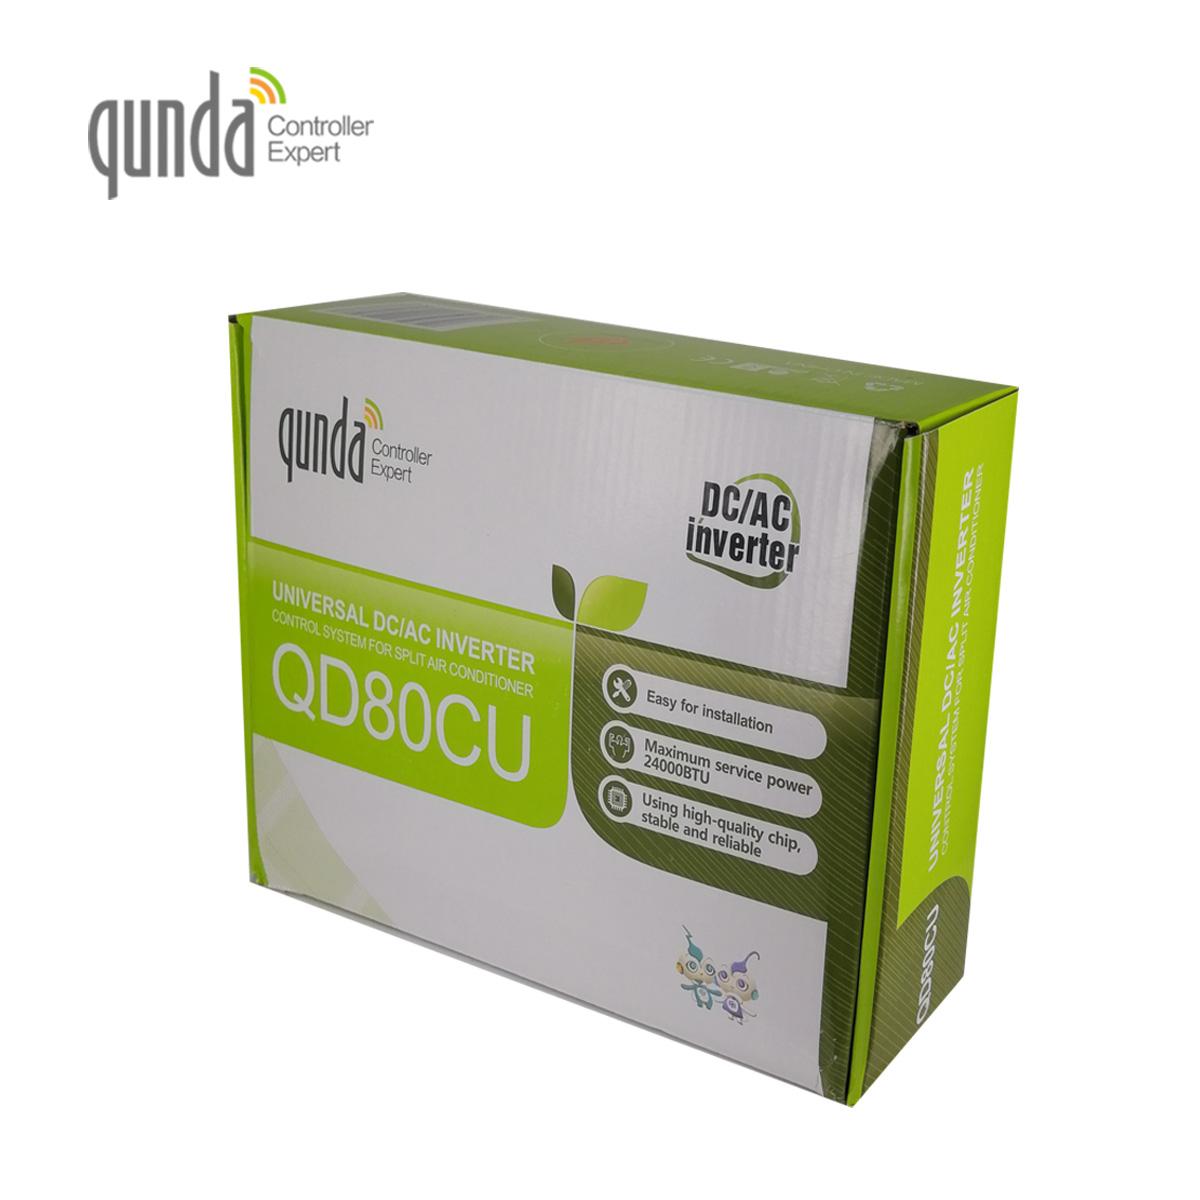 Qd80cu Universal Dc  Ac Inverter Control System For Split